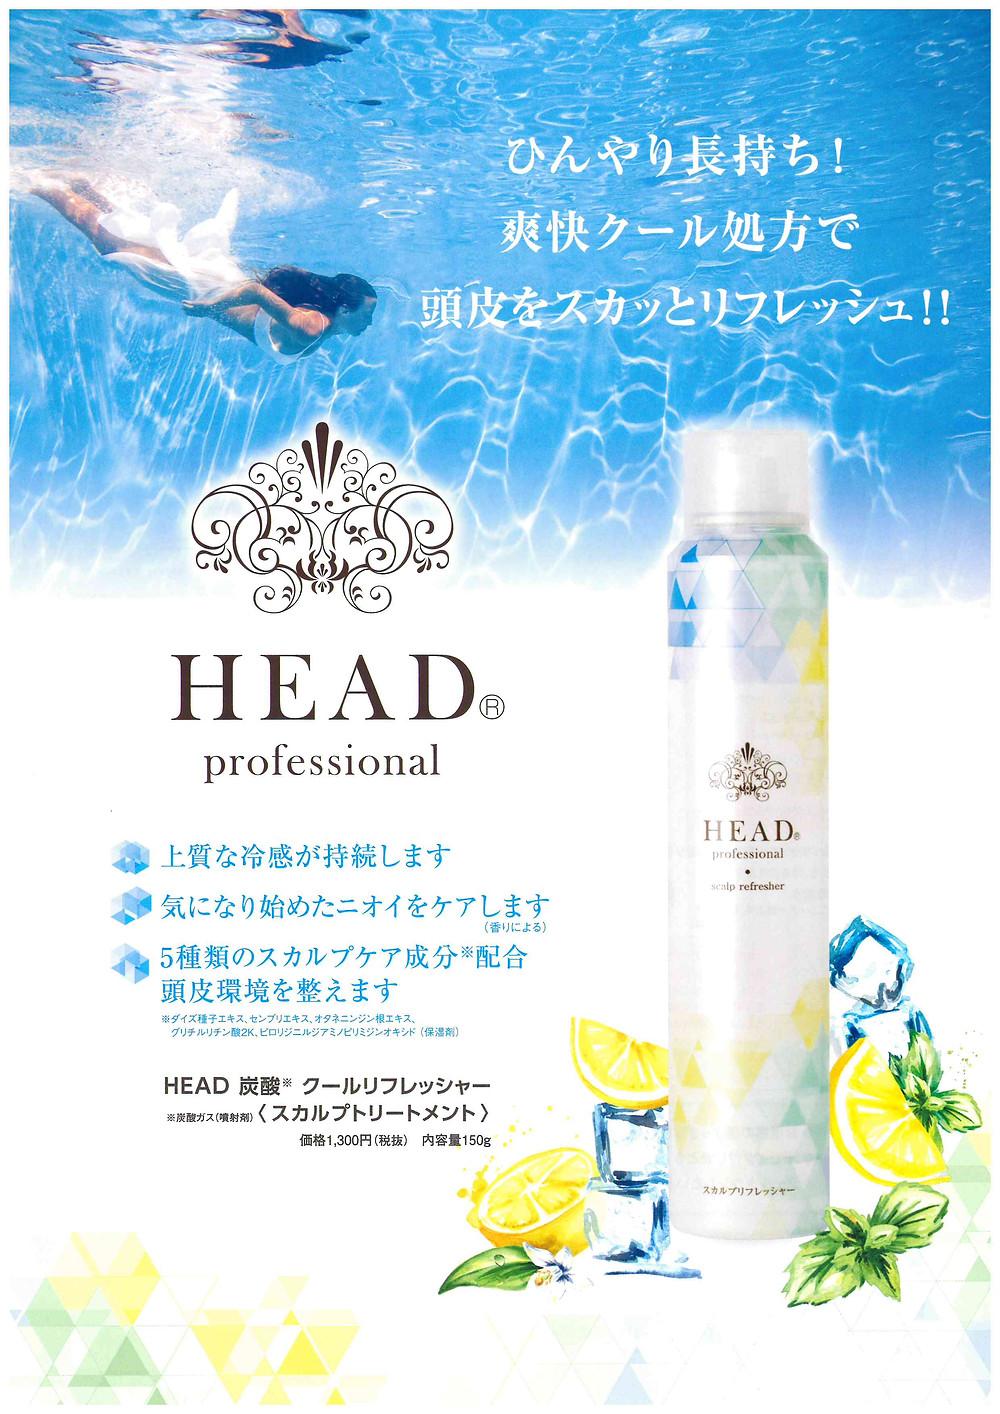 HEAD炭酸クールリフレッシャ―